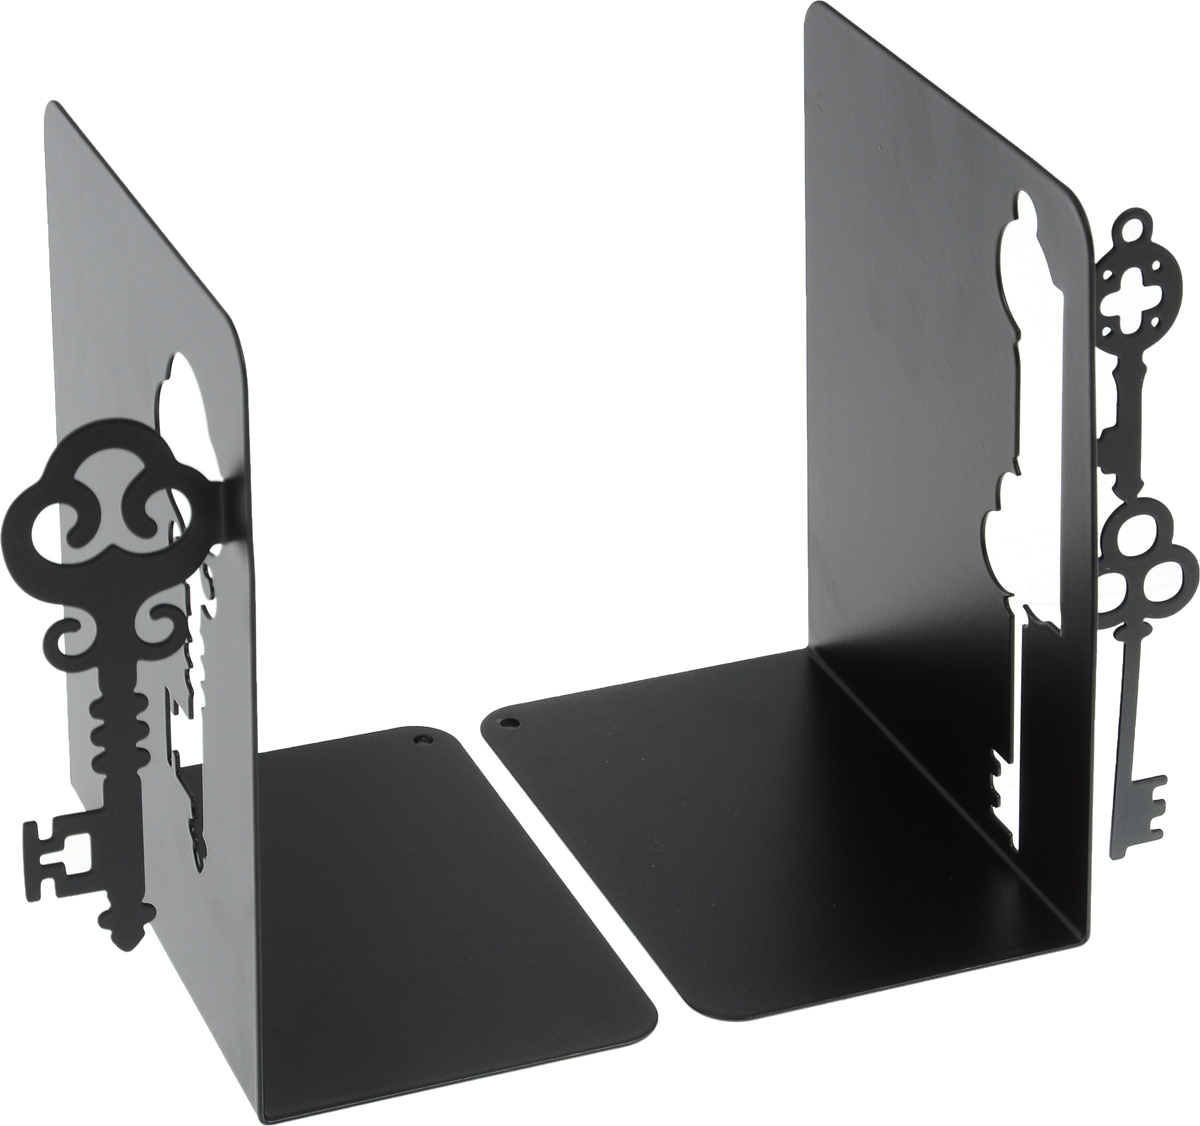 Подставка-ограничитель декоративная для книг Феникс-Презент Ключи, 2 шт подставка ограничитель для книг купола